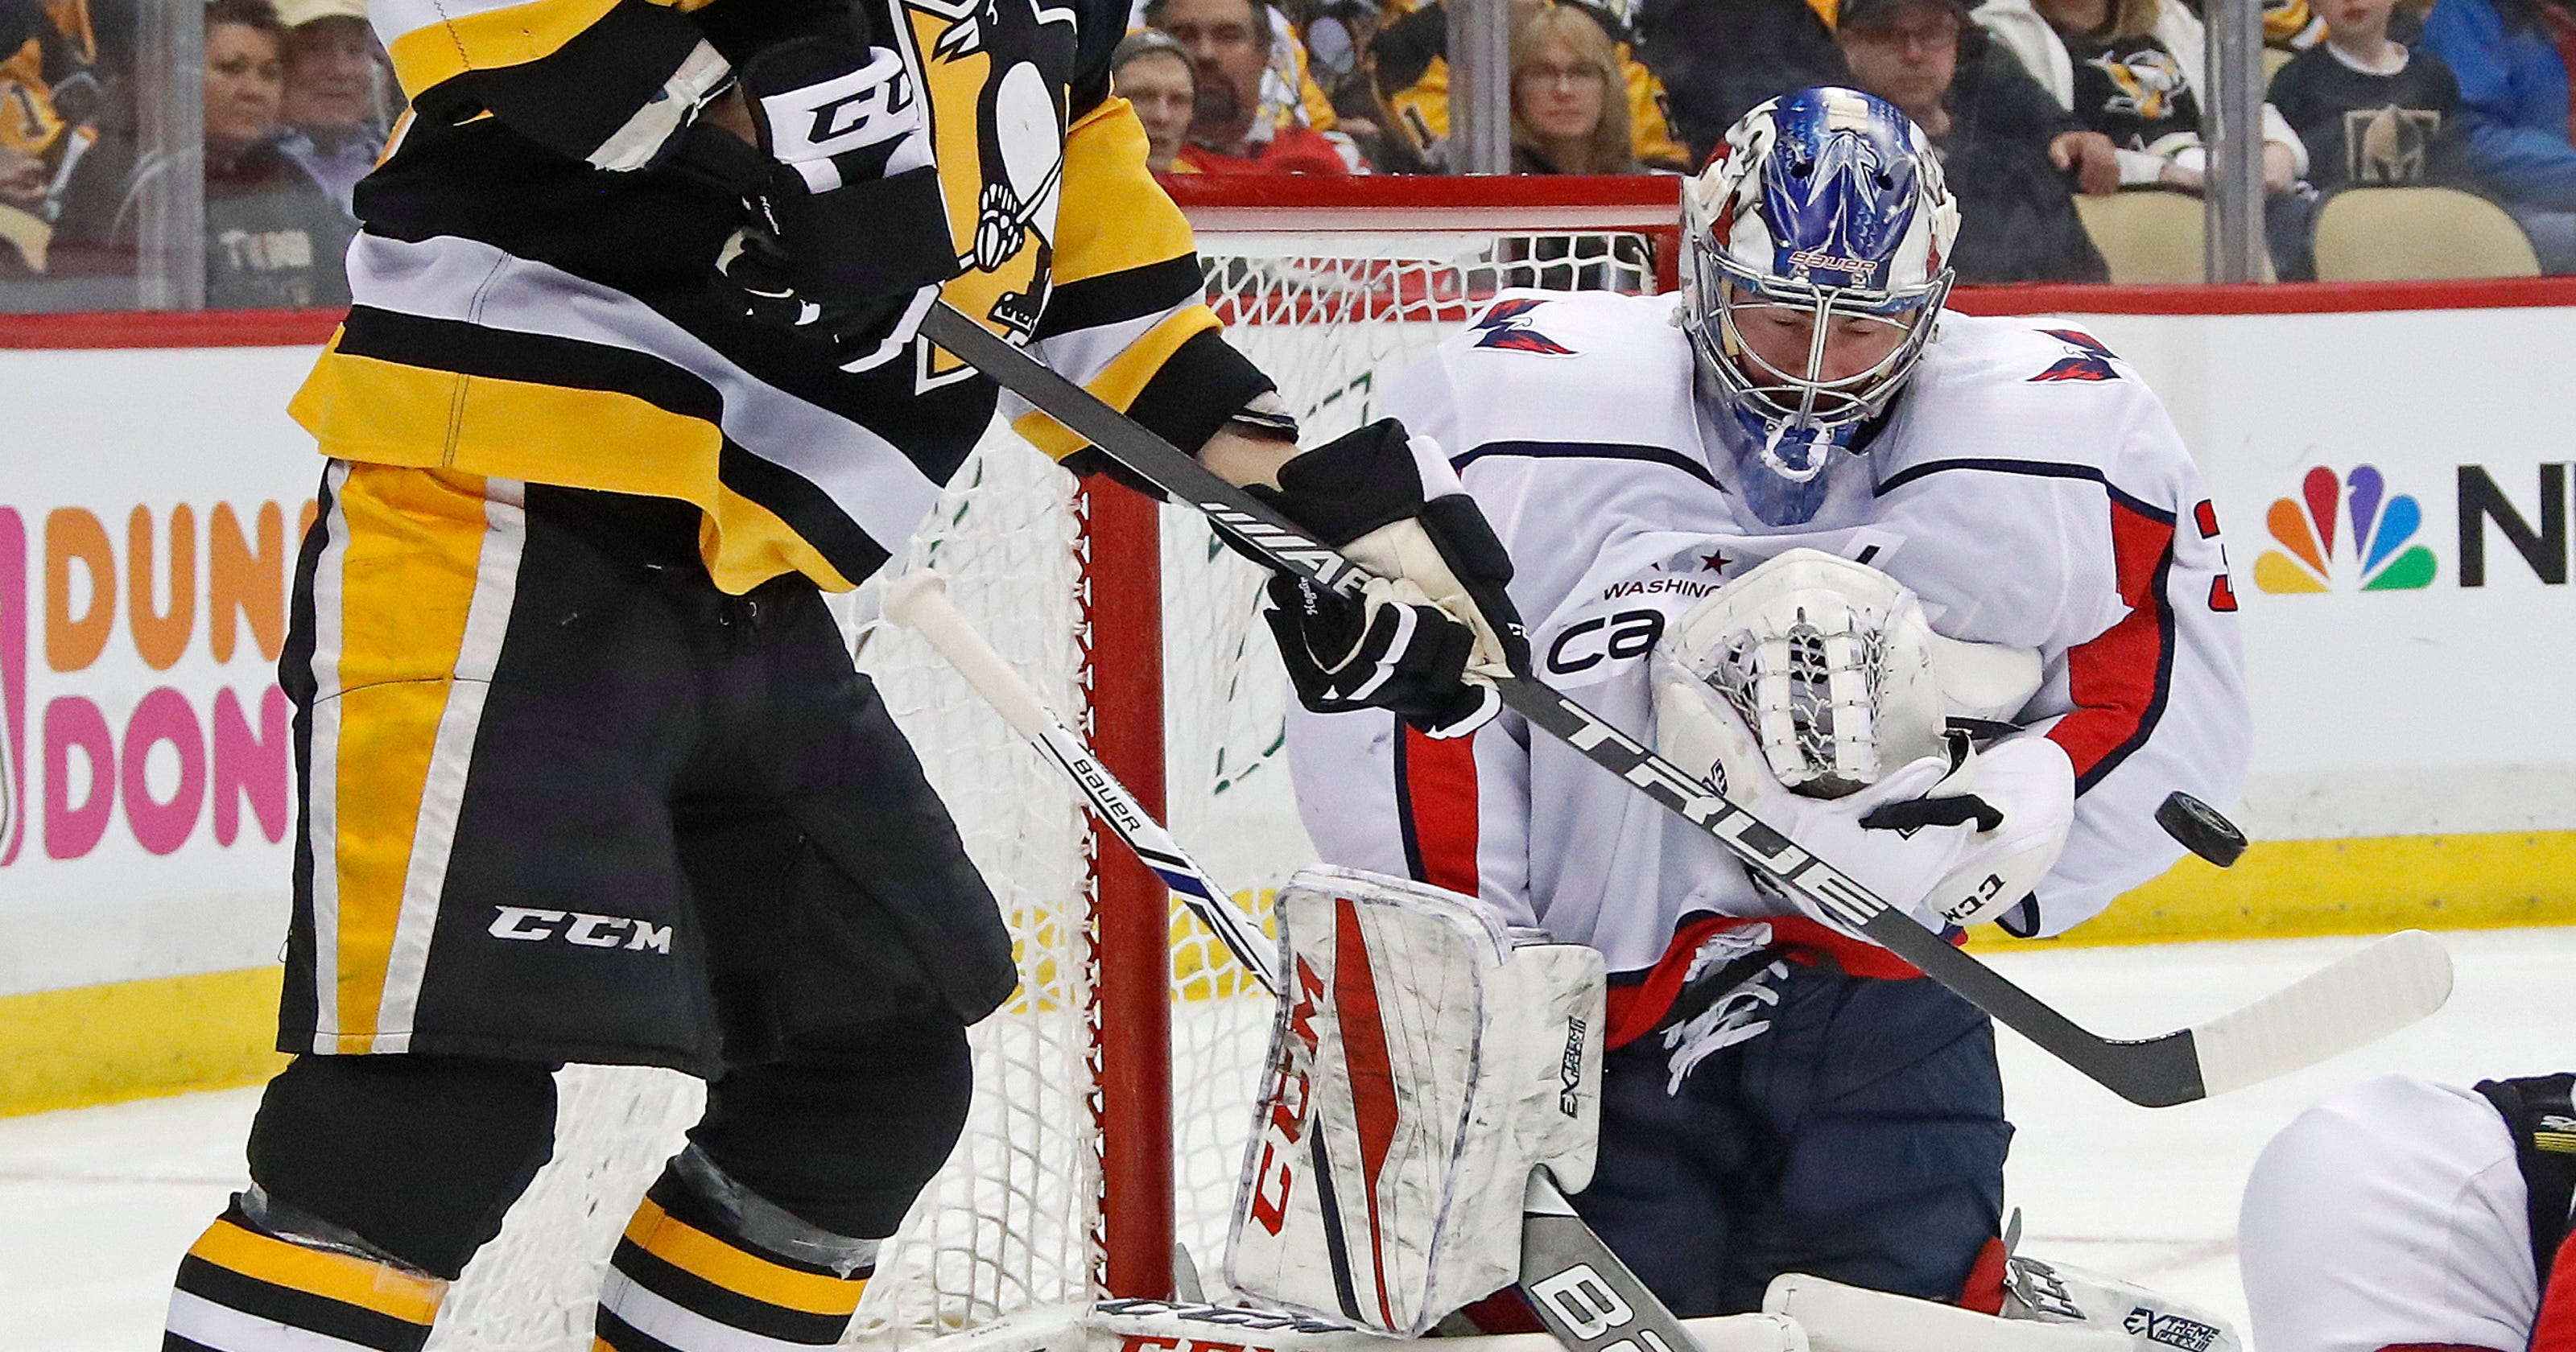 Capitals beat Penguins to clinch Metropolitan Division title 676c3b288efa